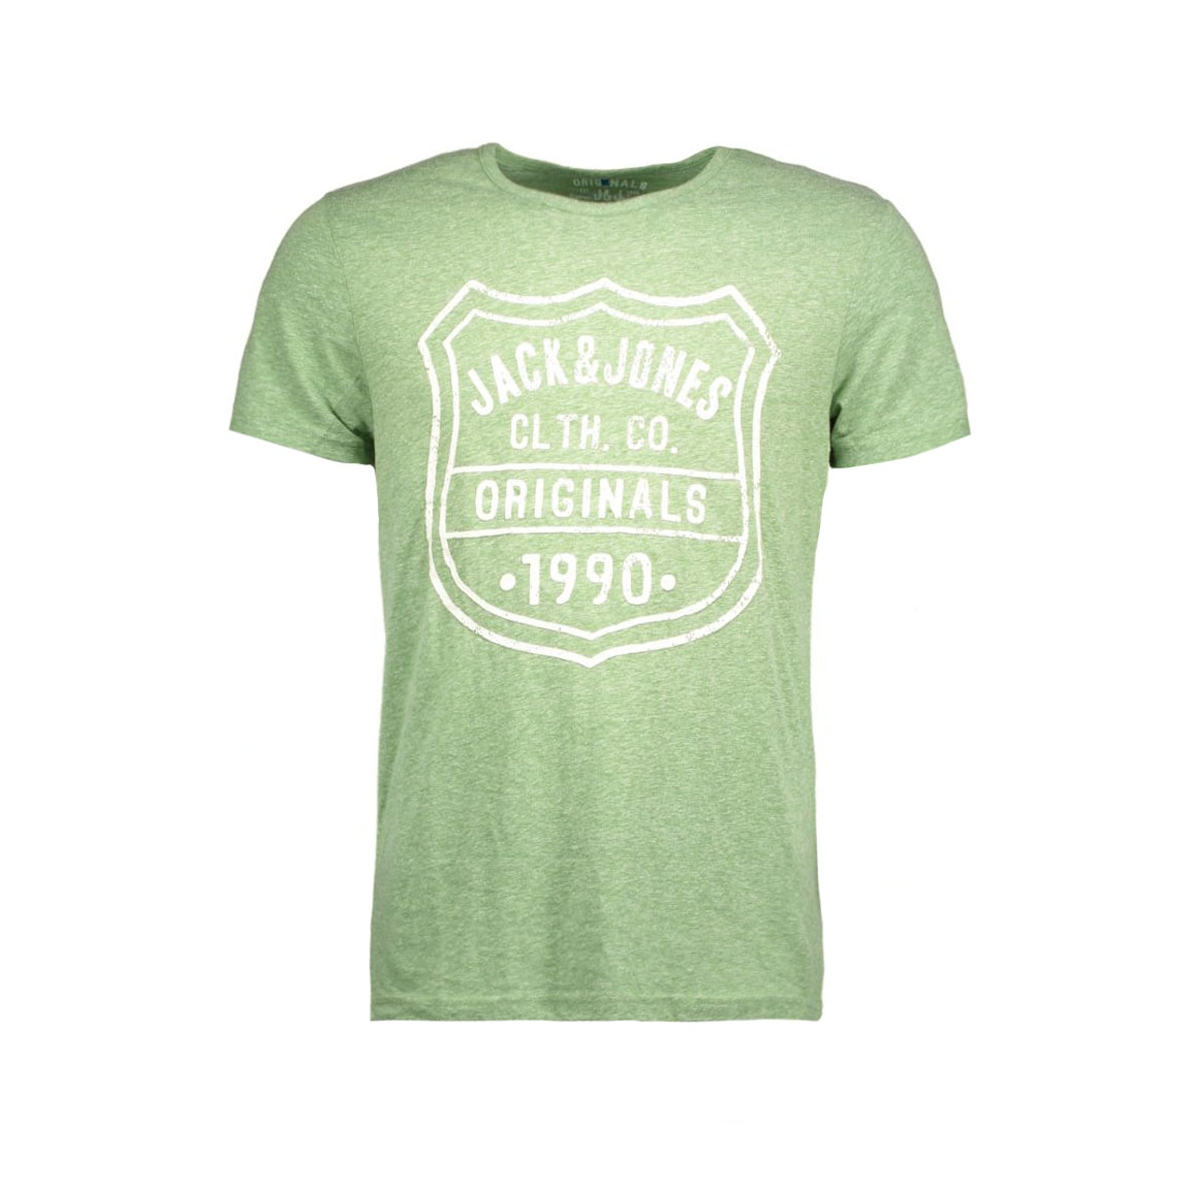 jorbullypocket tee ss crew neck 12106505 jack & jones t-shirt verdant green/print.tal